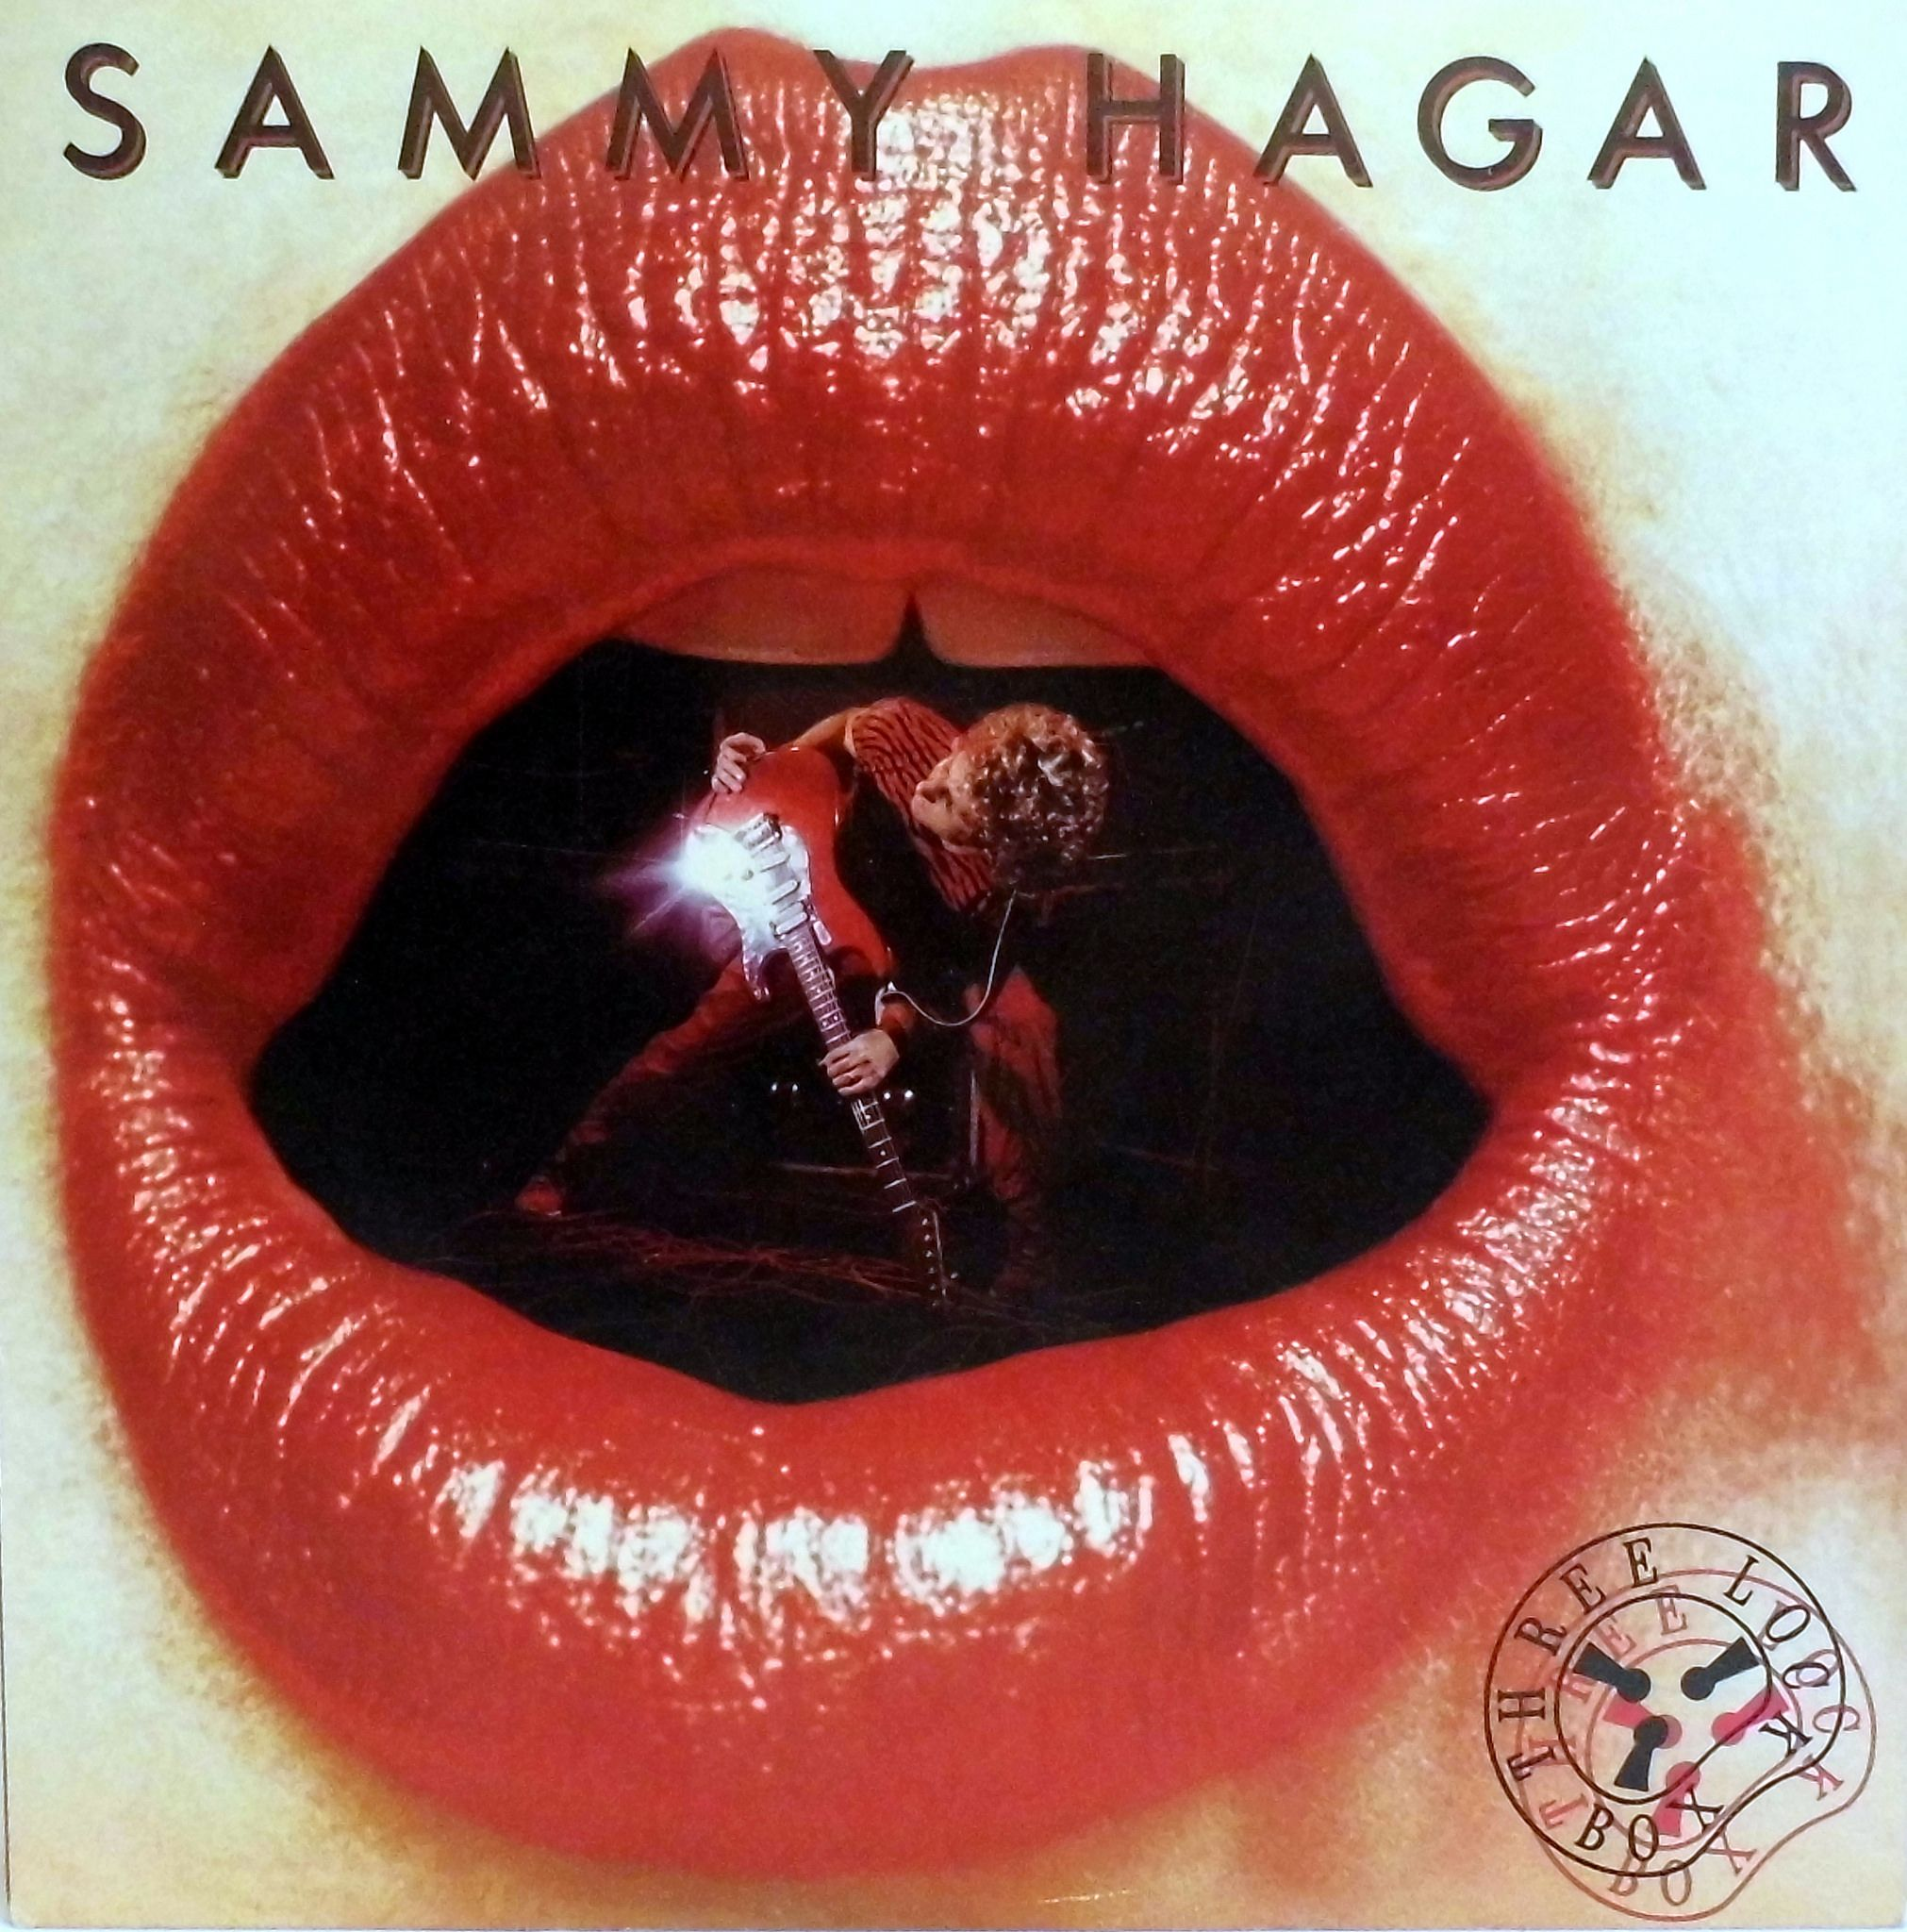 Vintage Lp Vinyl Record Collection Three Lock Box Album By Sammy Hagar Catalog Number Ghs 2021 Geffen Records Copyright 1982 Rock Album Covers Sammy Hagar Classic Rock Albums